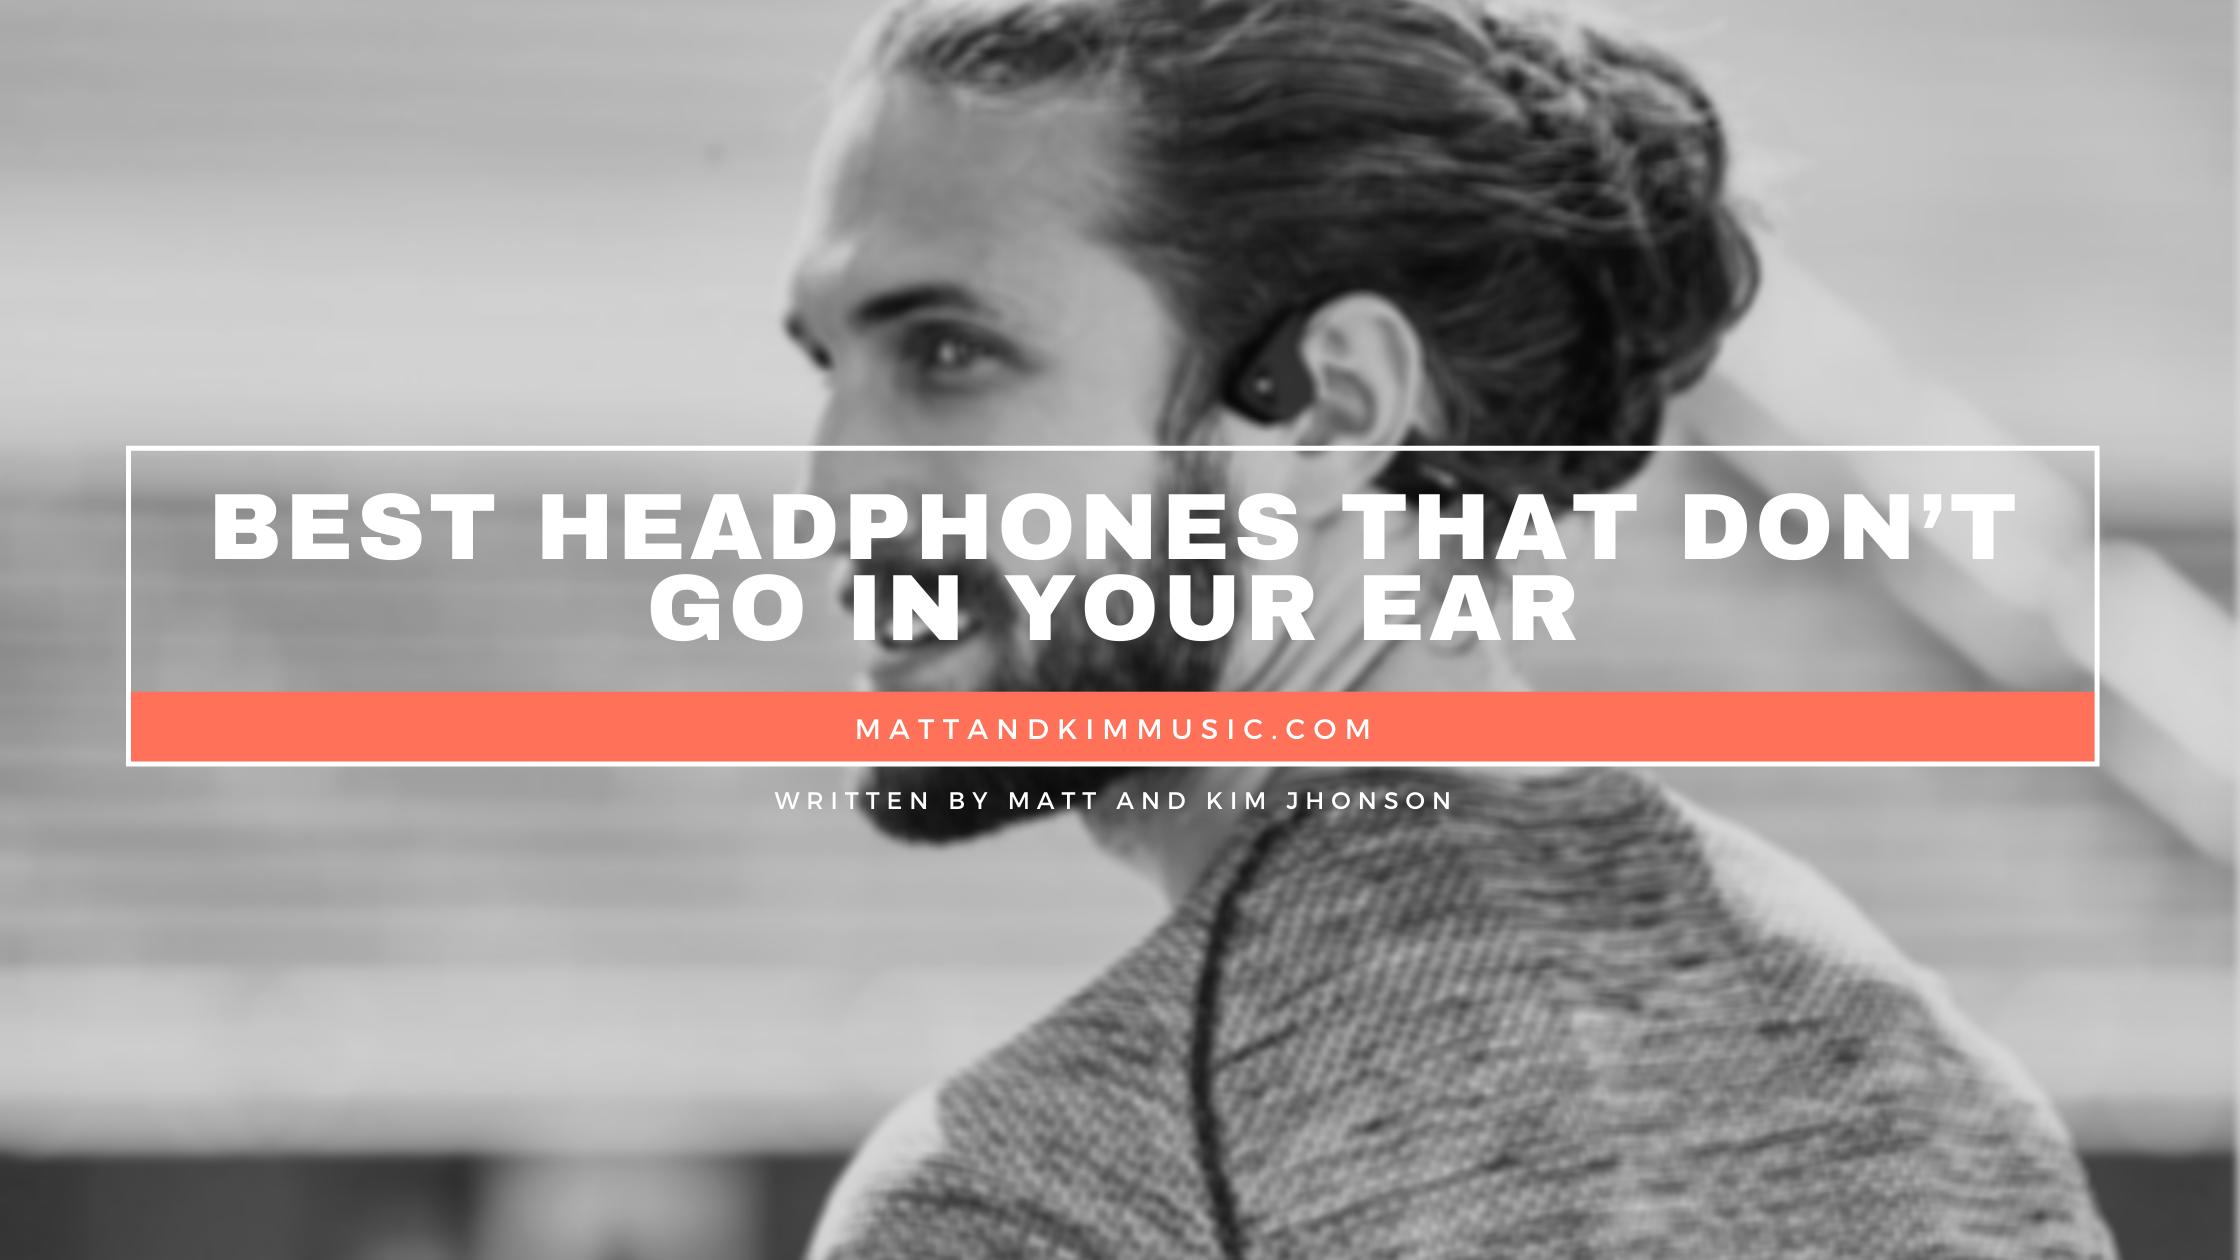 best headphones that don't go in your ear